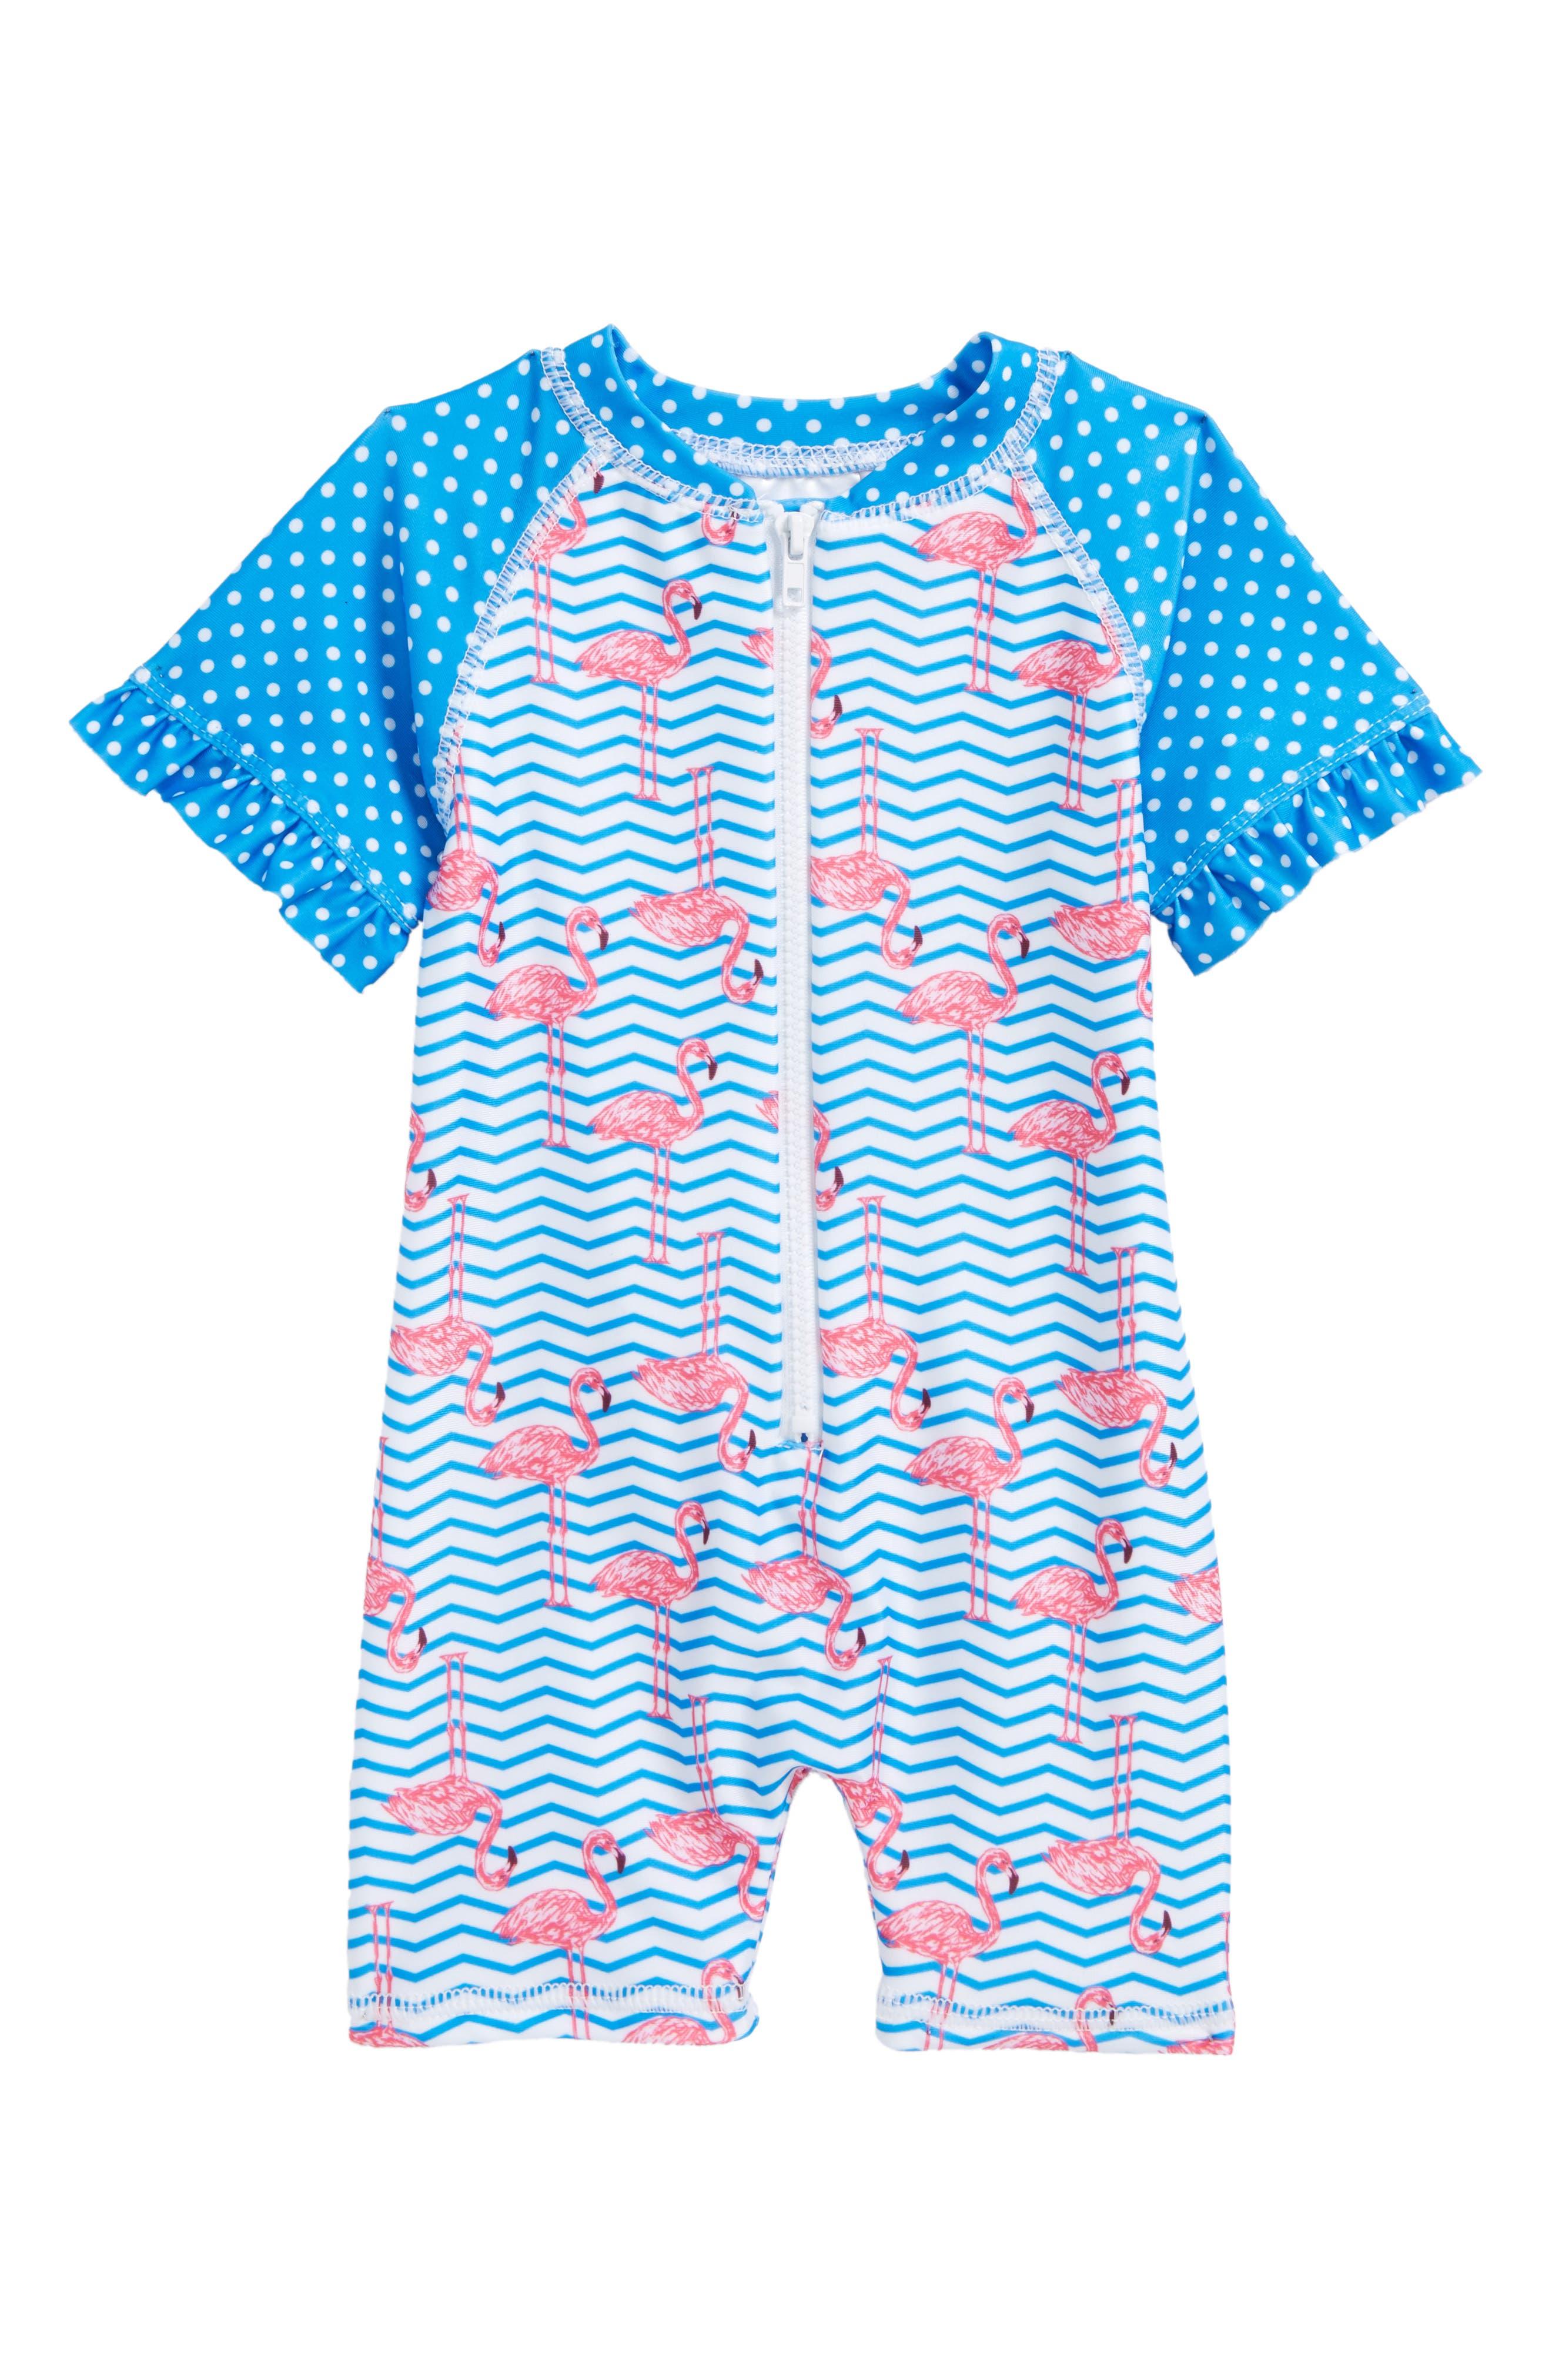 Zigzag Flamingos One-Piece Rashguard Swimsuit,                             Main thumbnail 1, color,                             Blue Multi